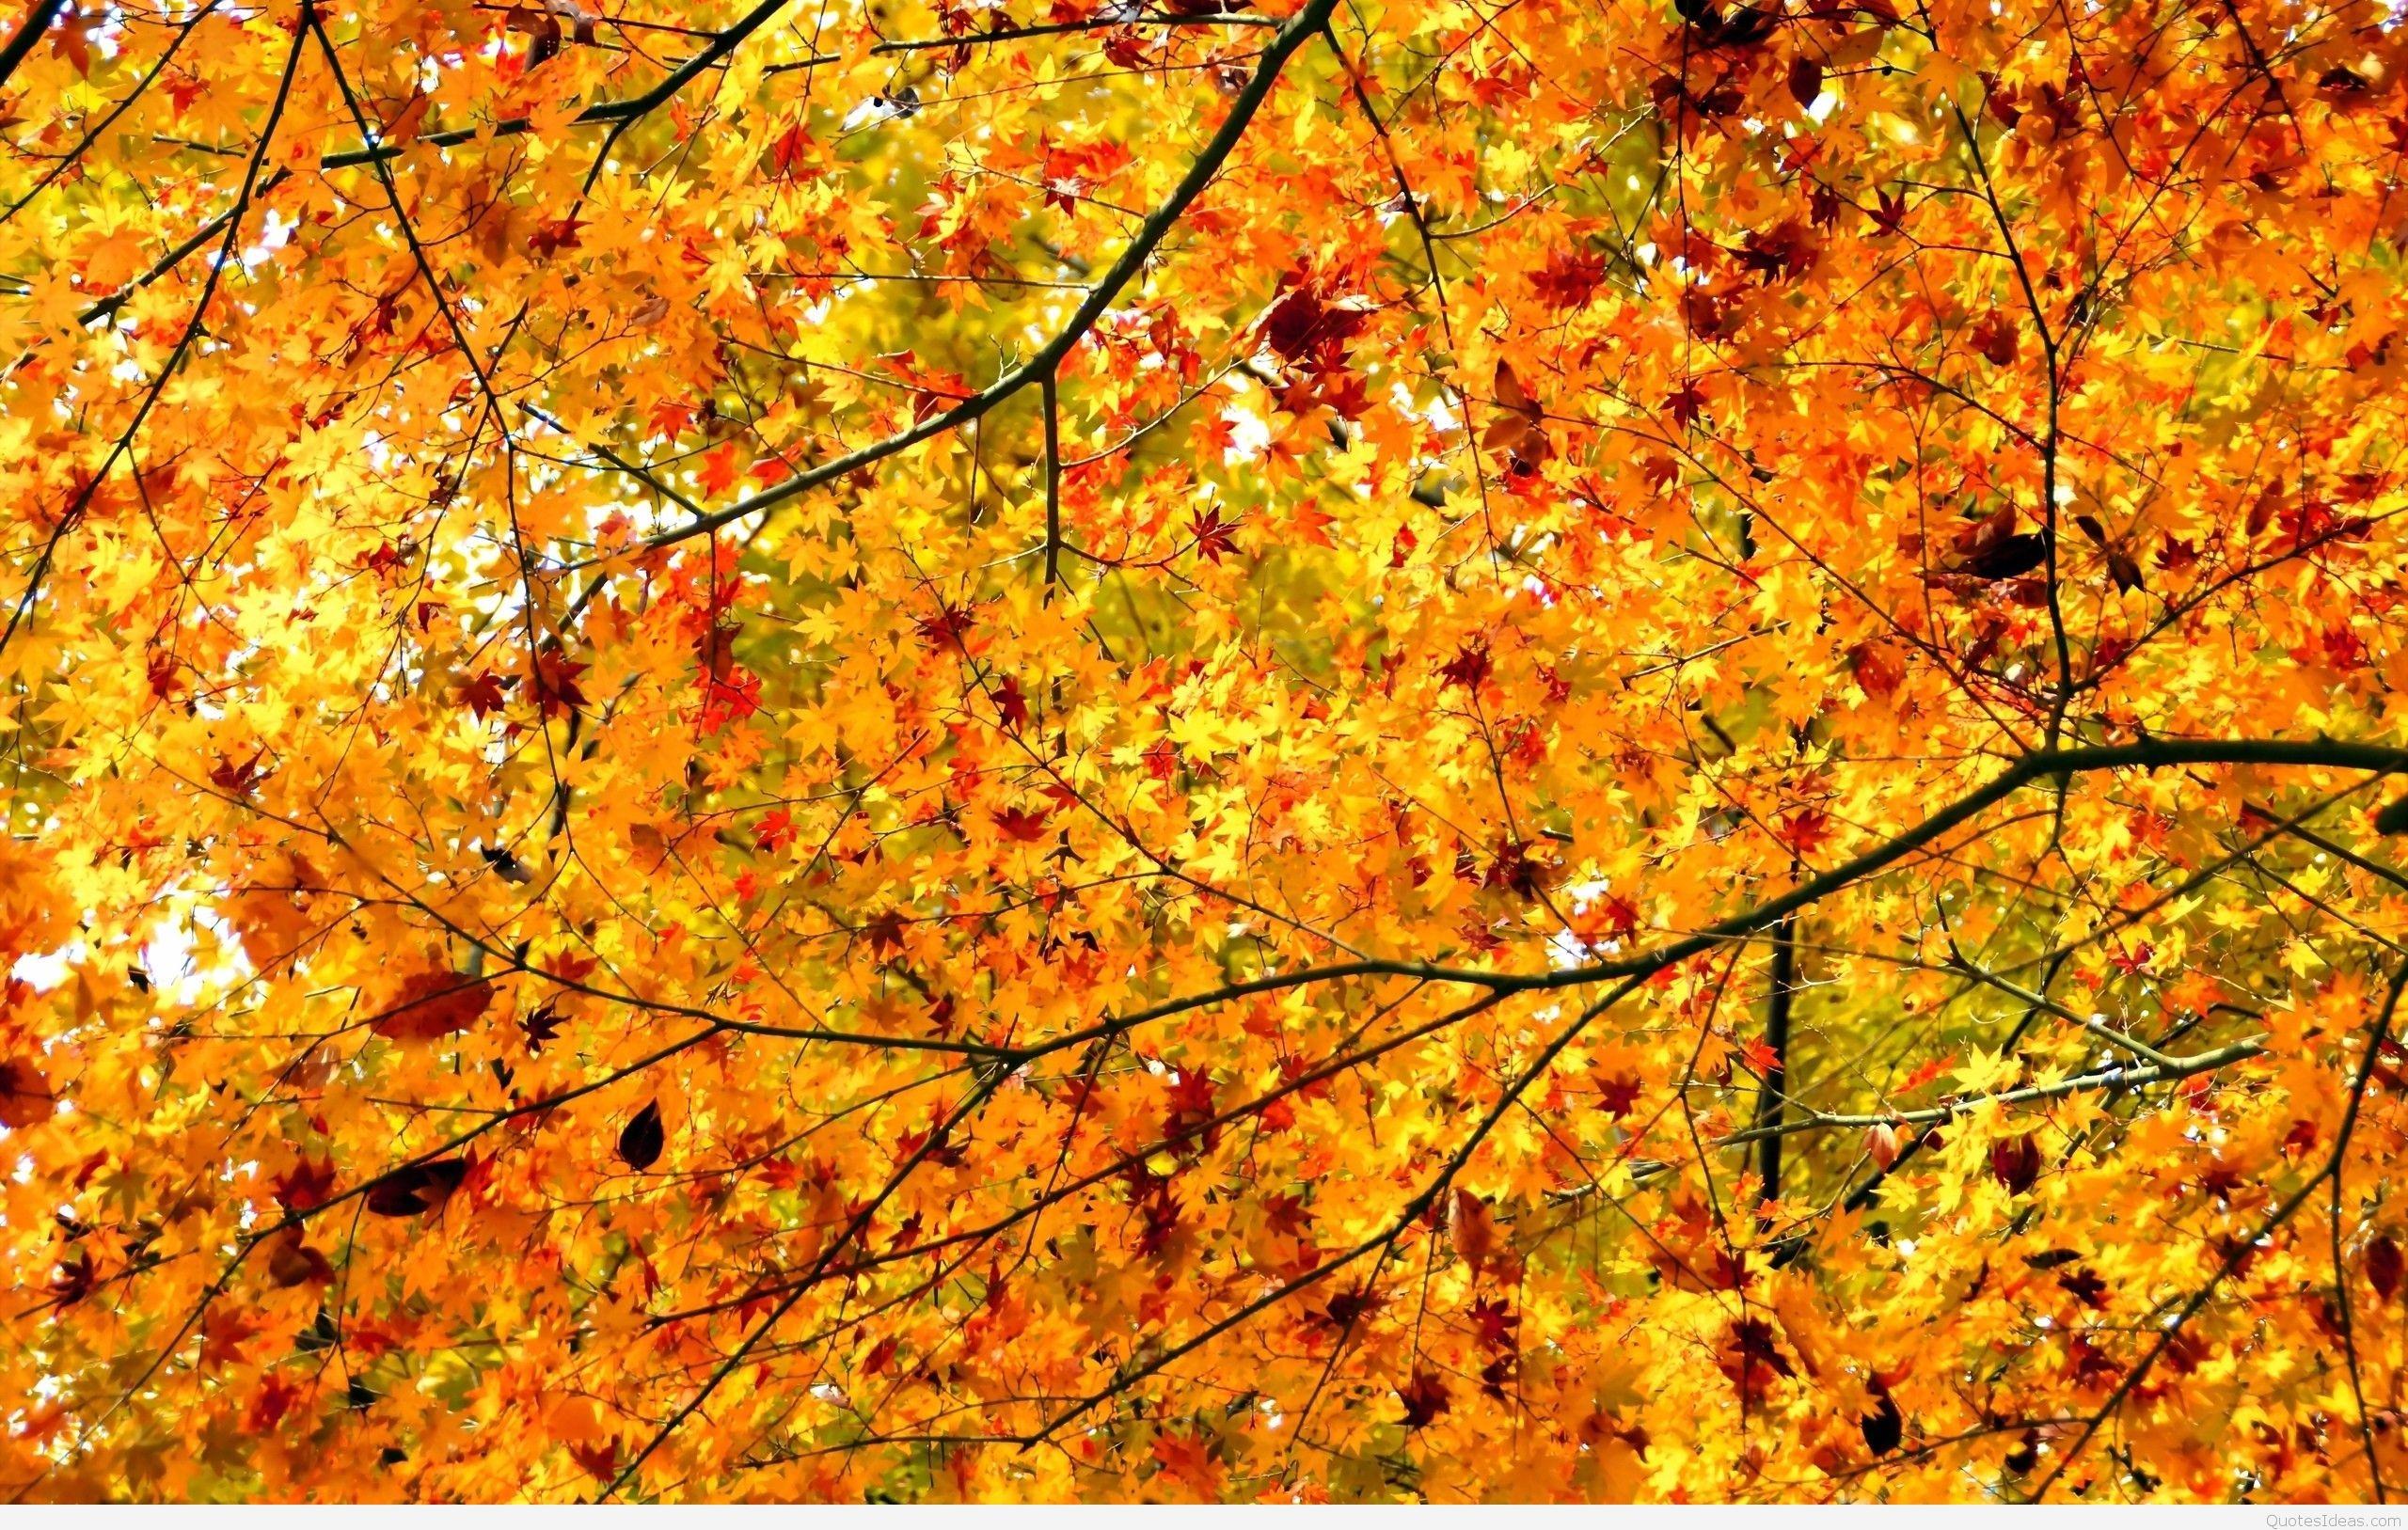 … autumn-leaves-hd-wallpaper …